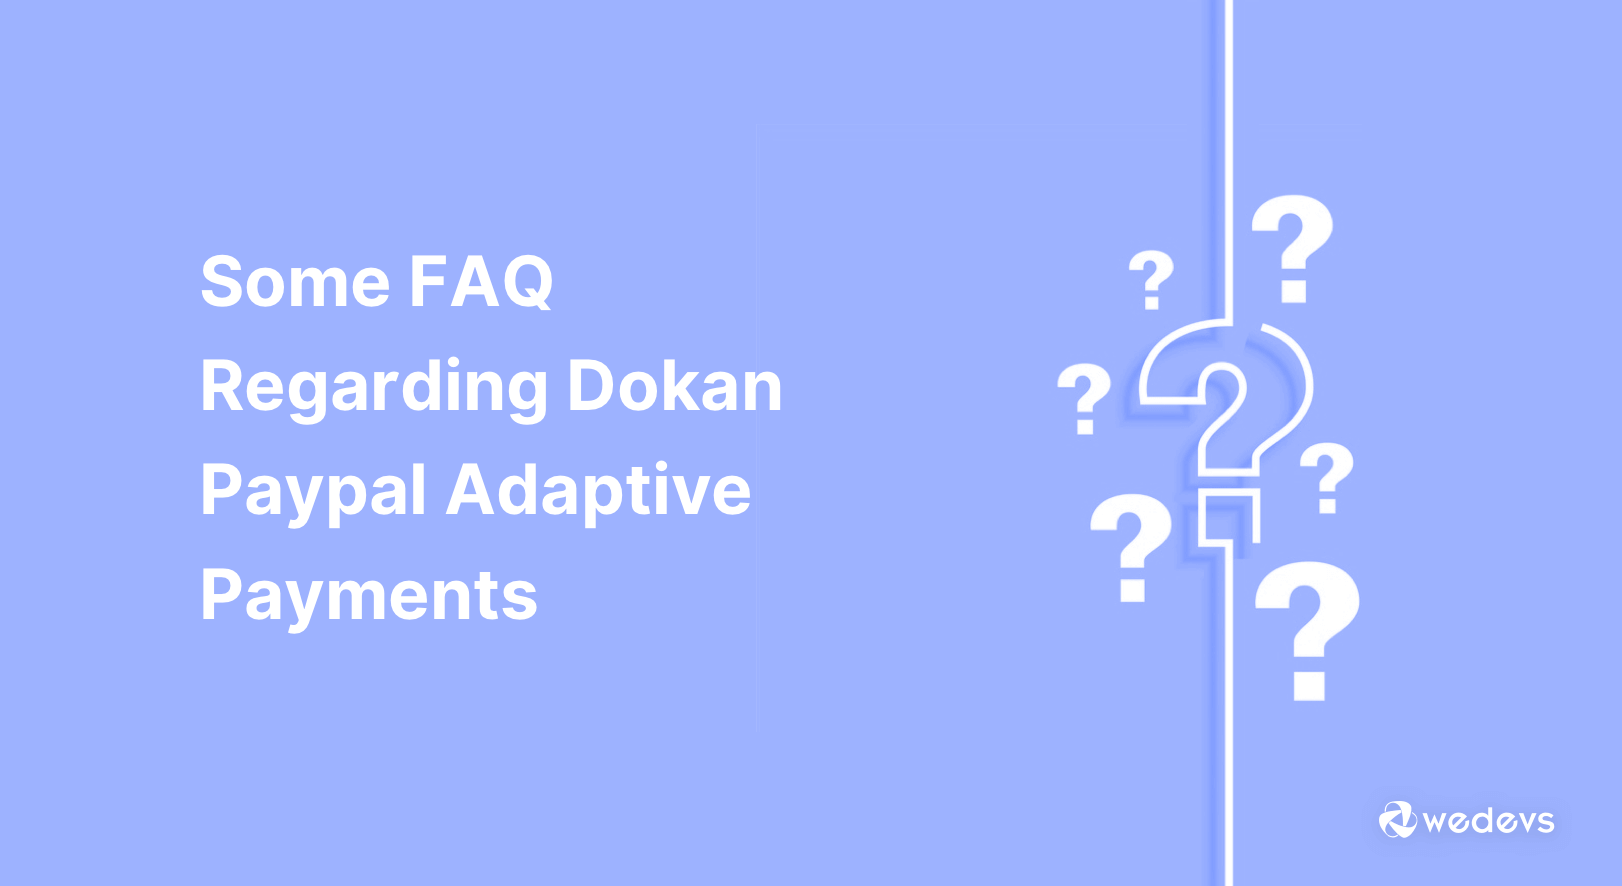 Some FAQ Regarding Dokan Paypal Adaptive Payments